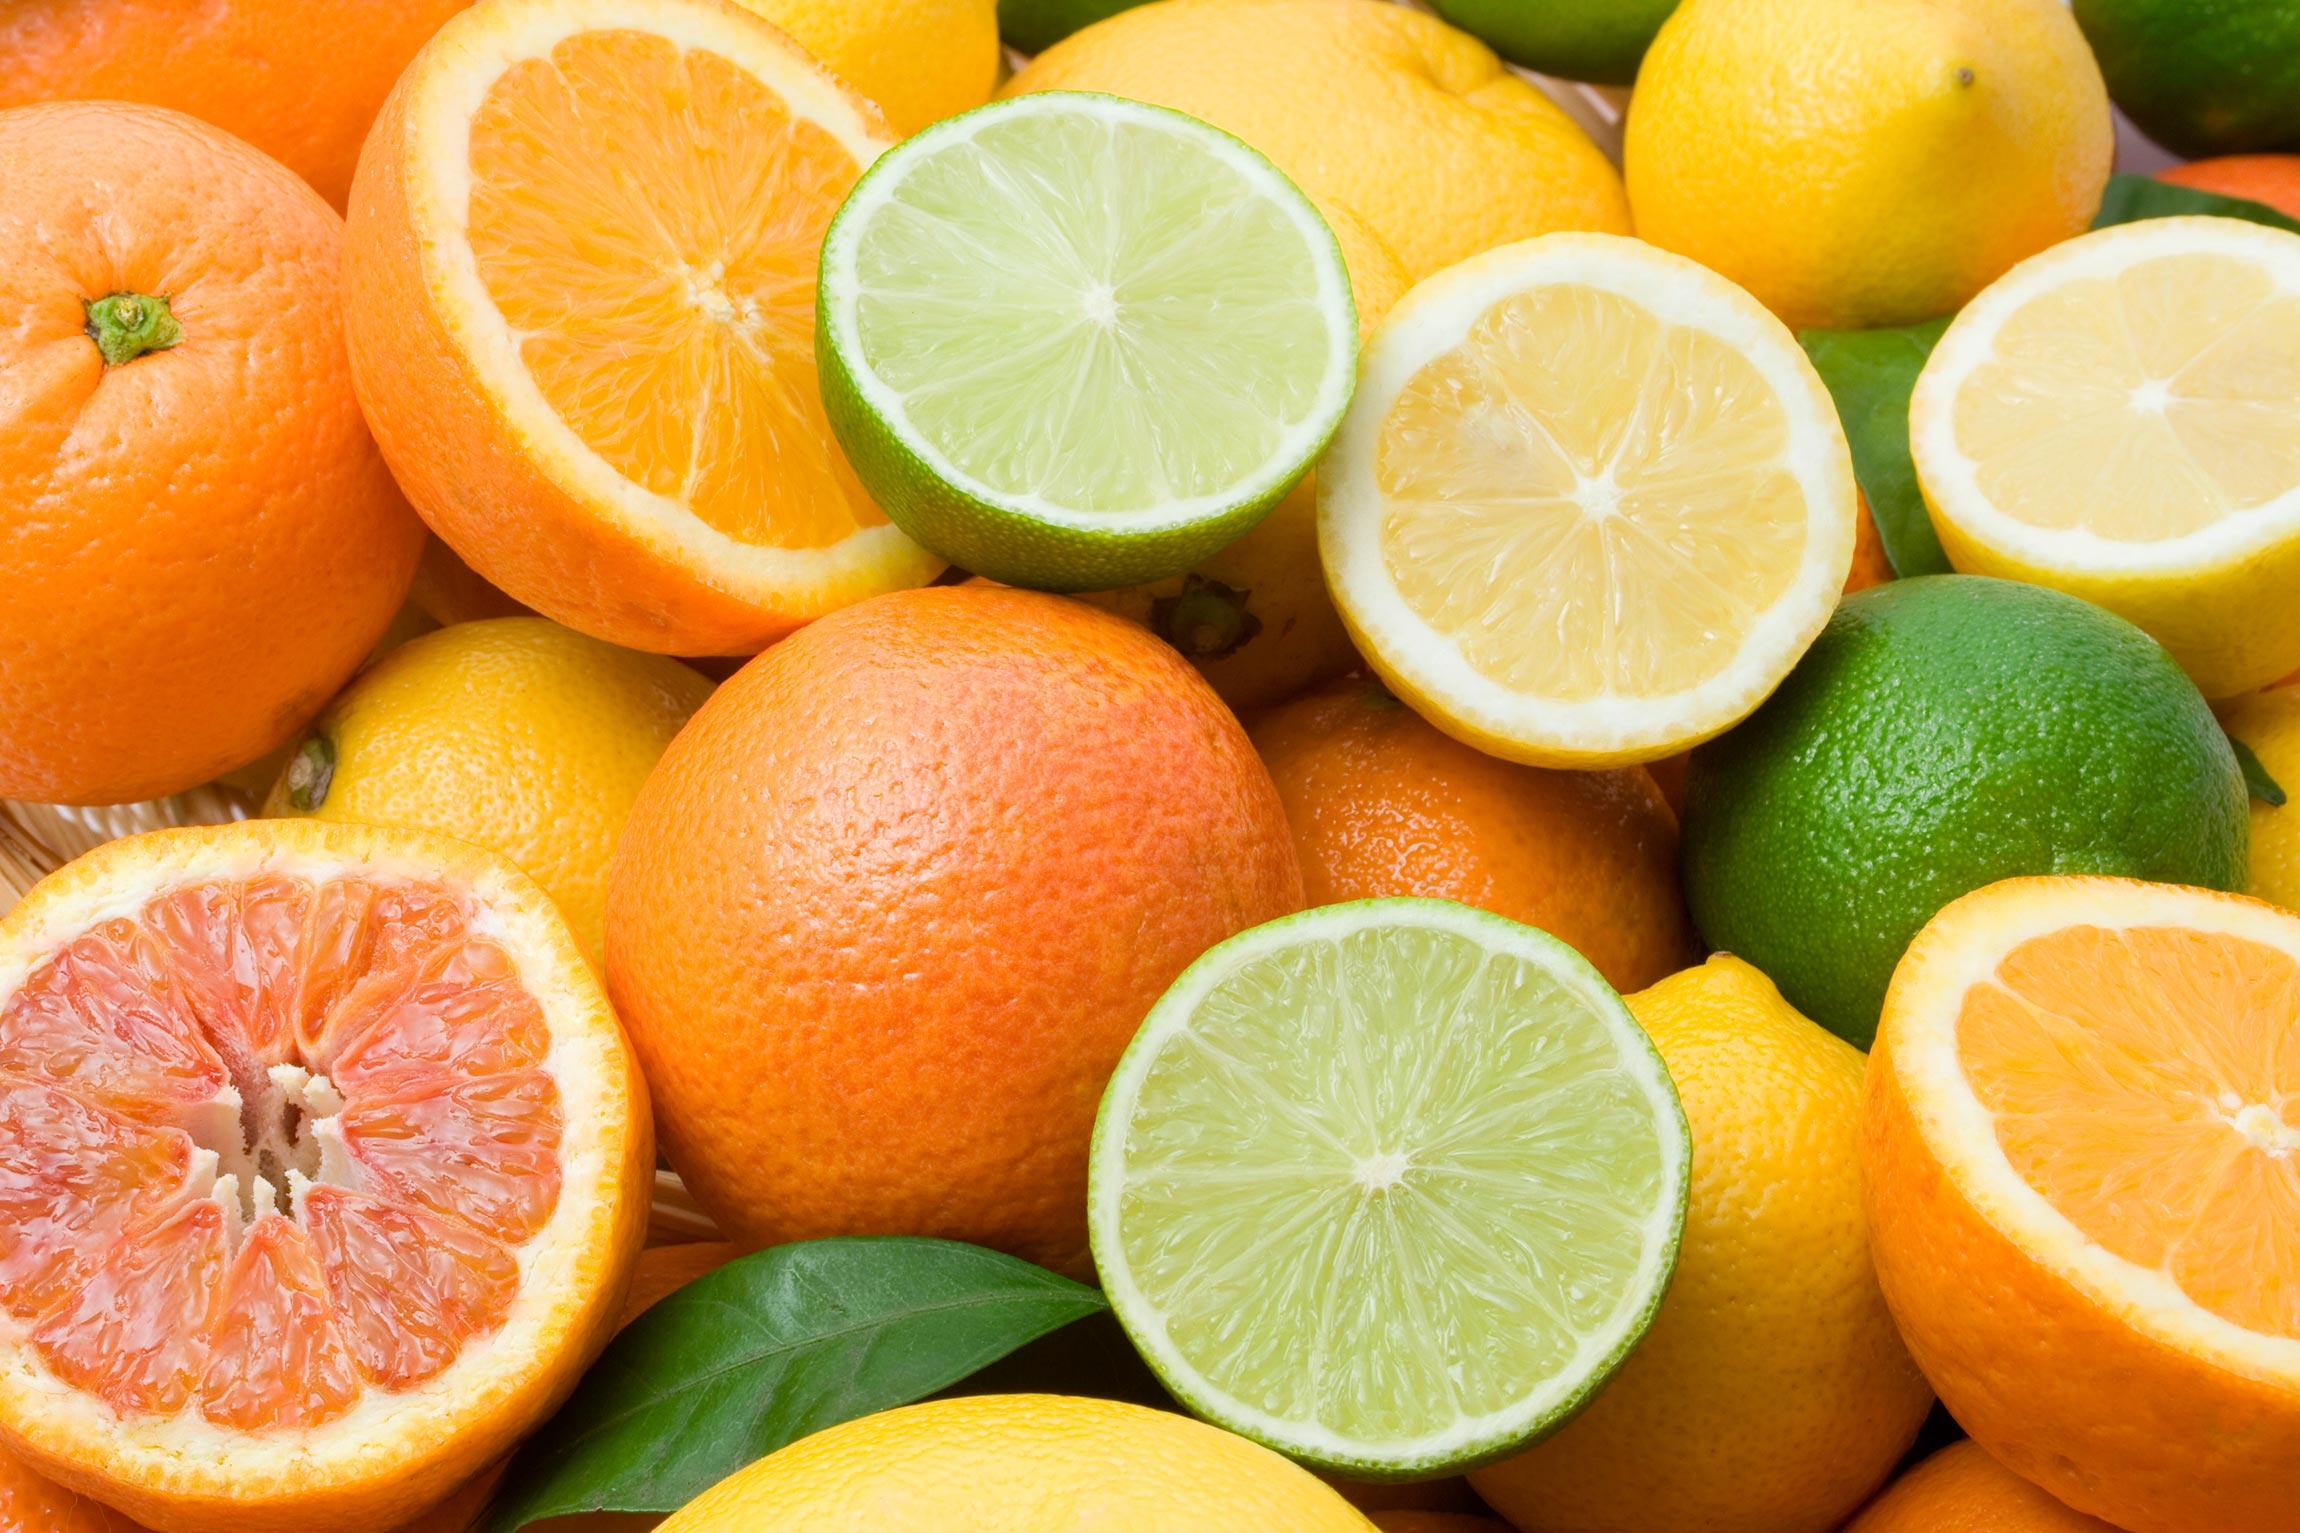 closeup of cut oranges, limes, lemons